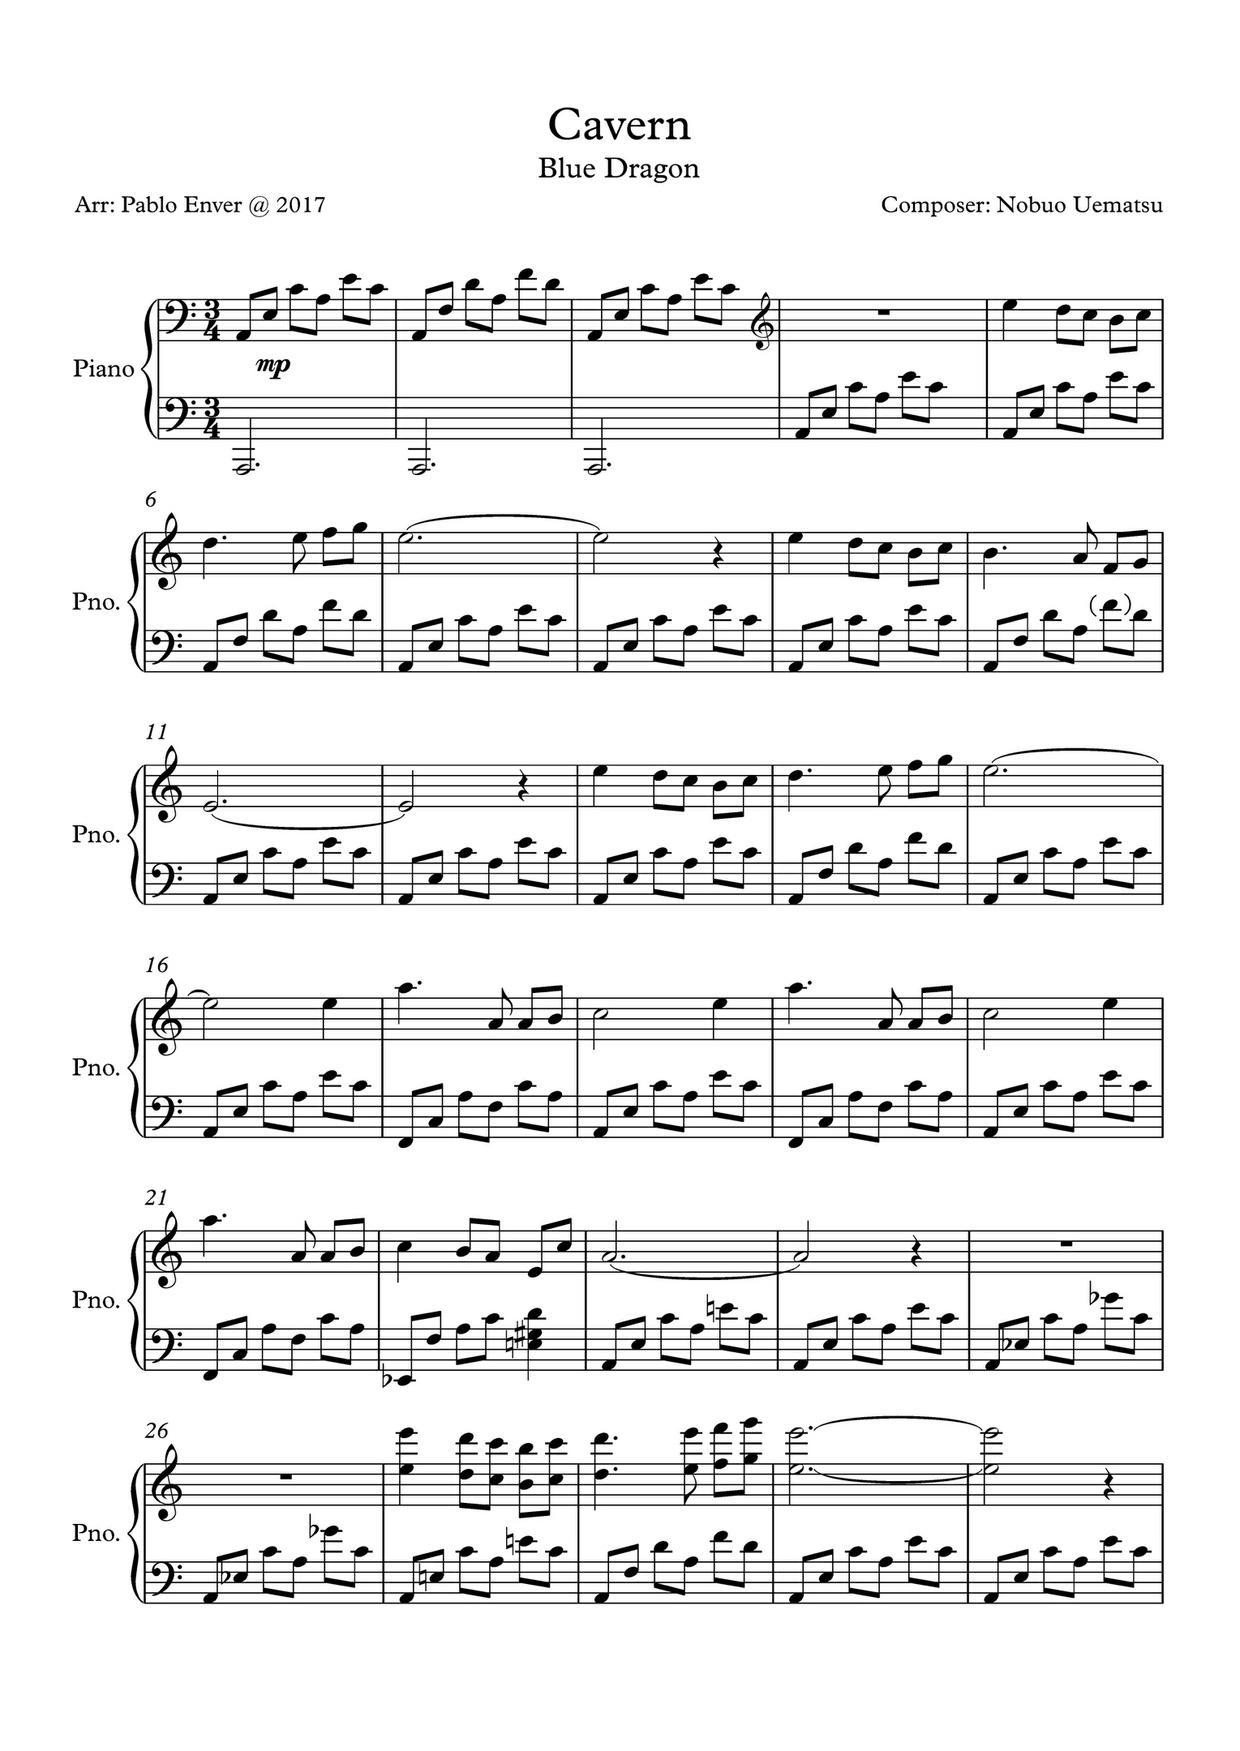 PIANO ARRANGEMENTS